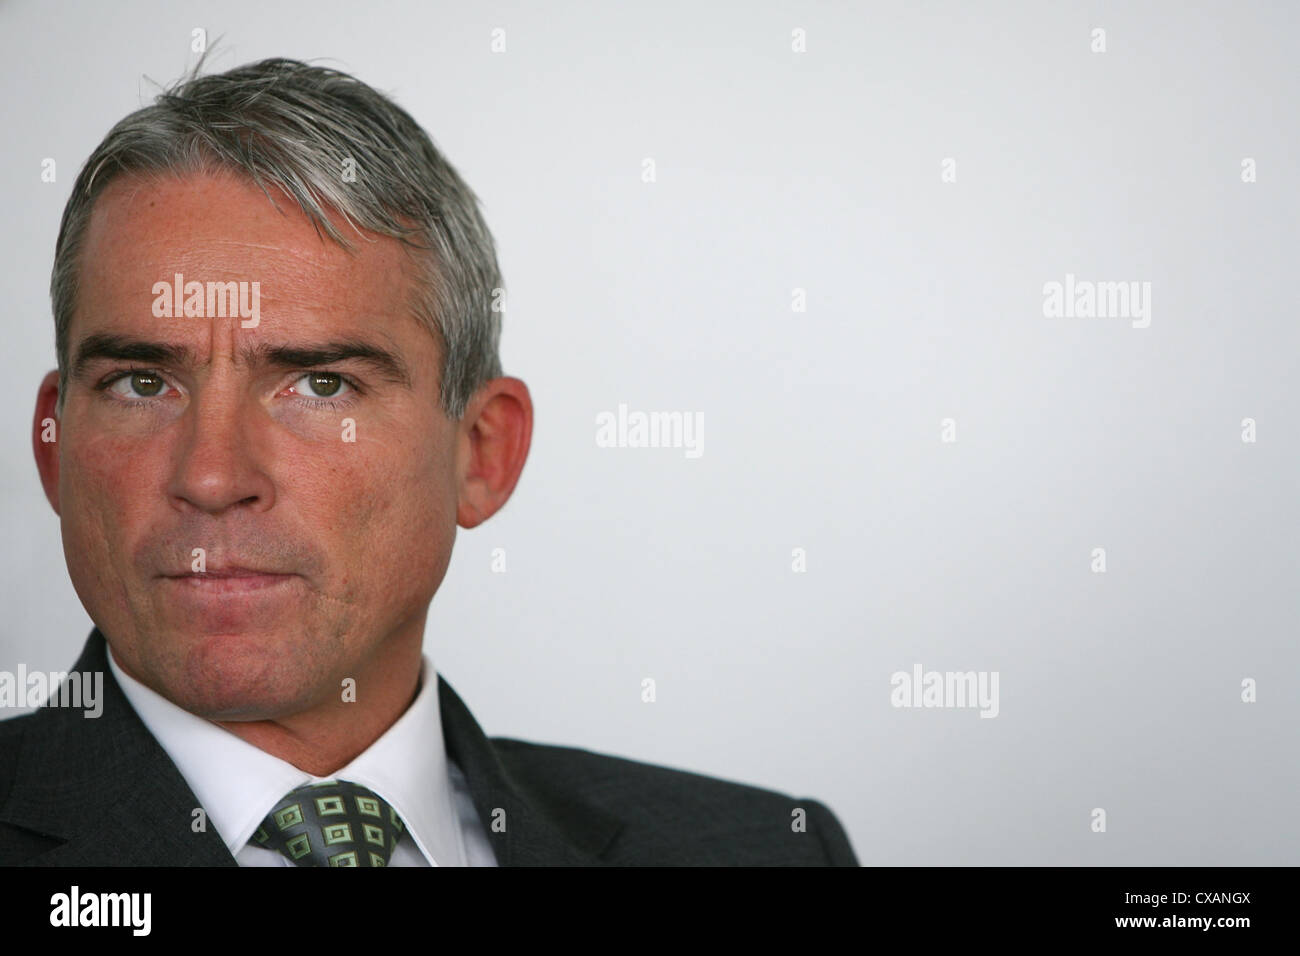 Thomas Strobl, Member of Parliament - Stock Image